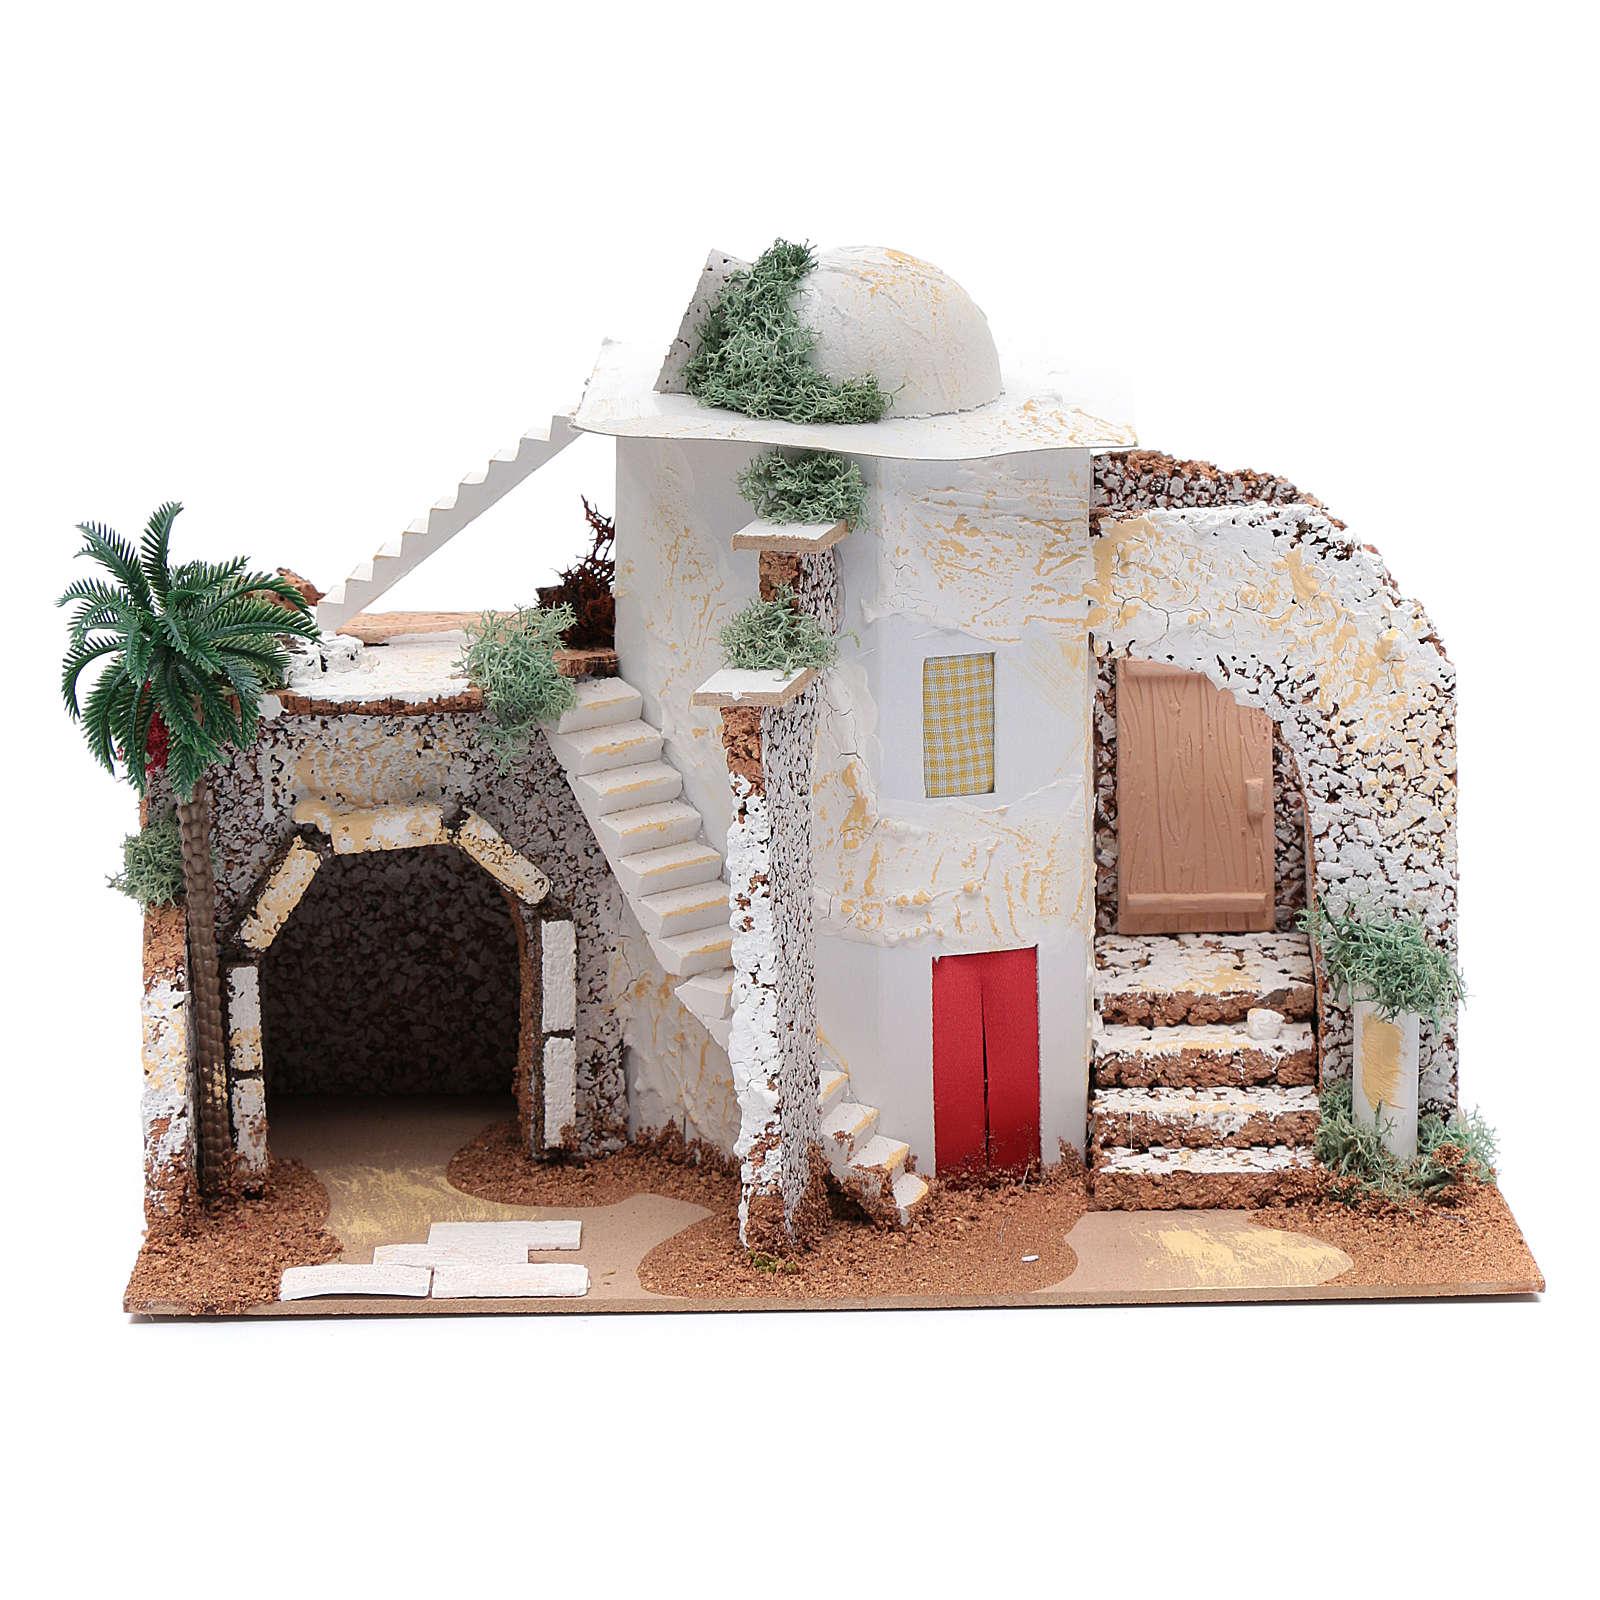 Nativity scene setting Arabian house 25x33x15 cm 4